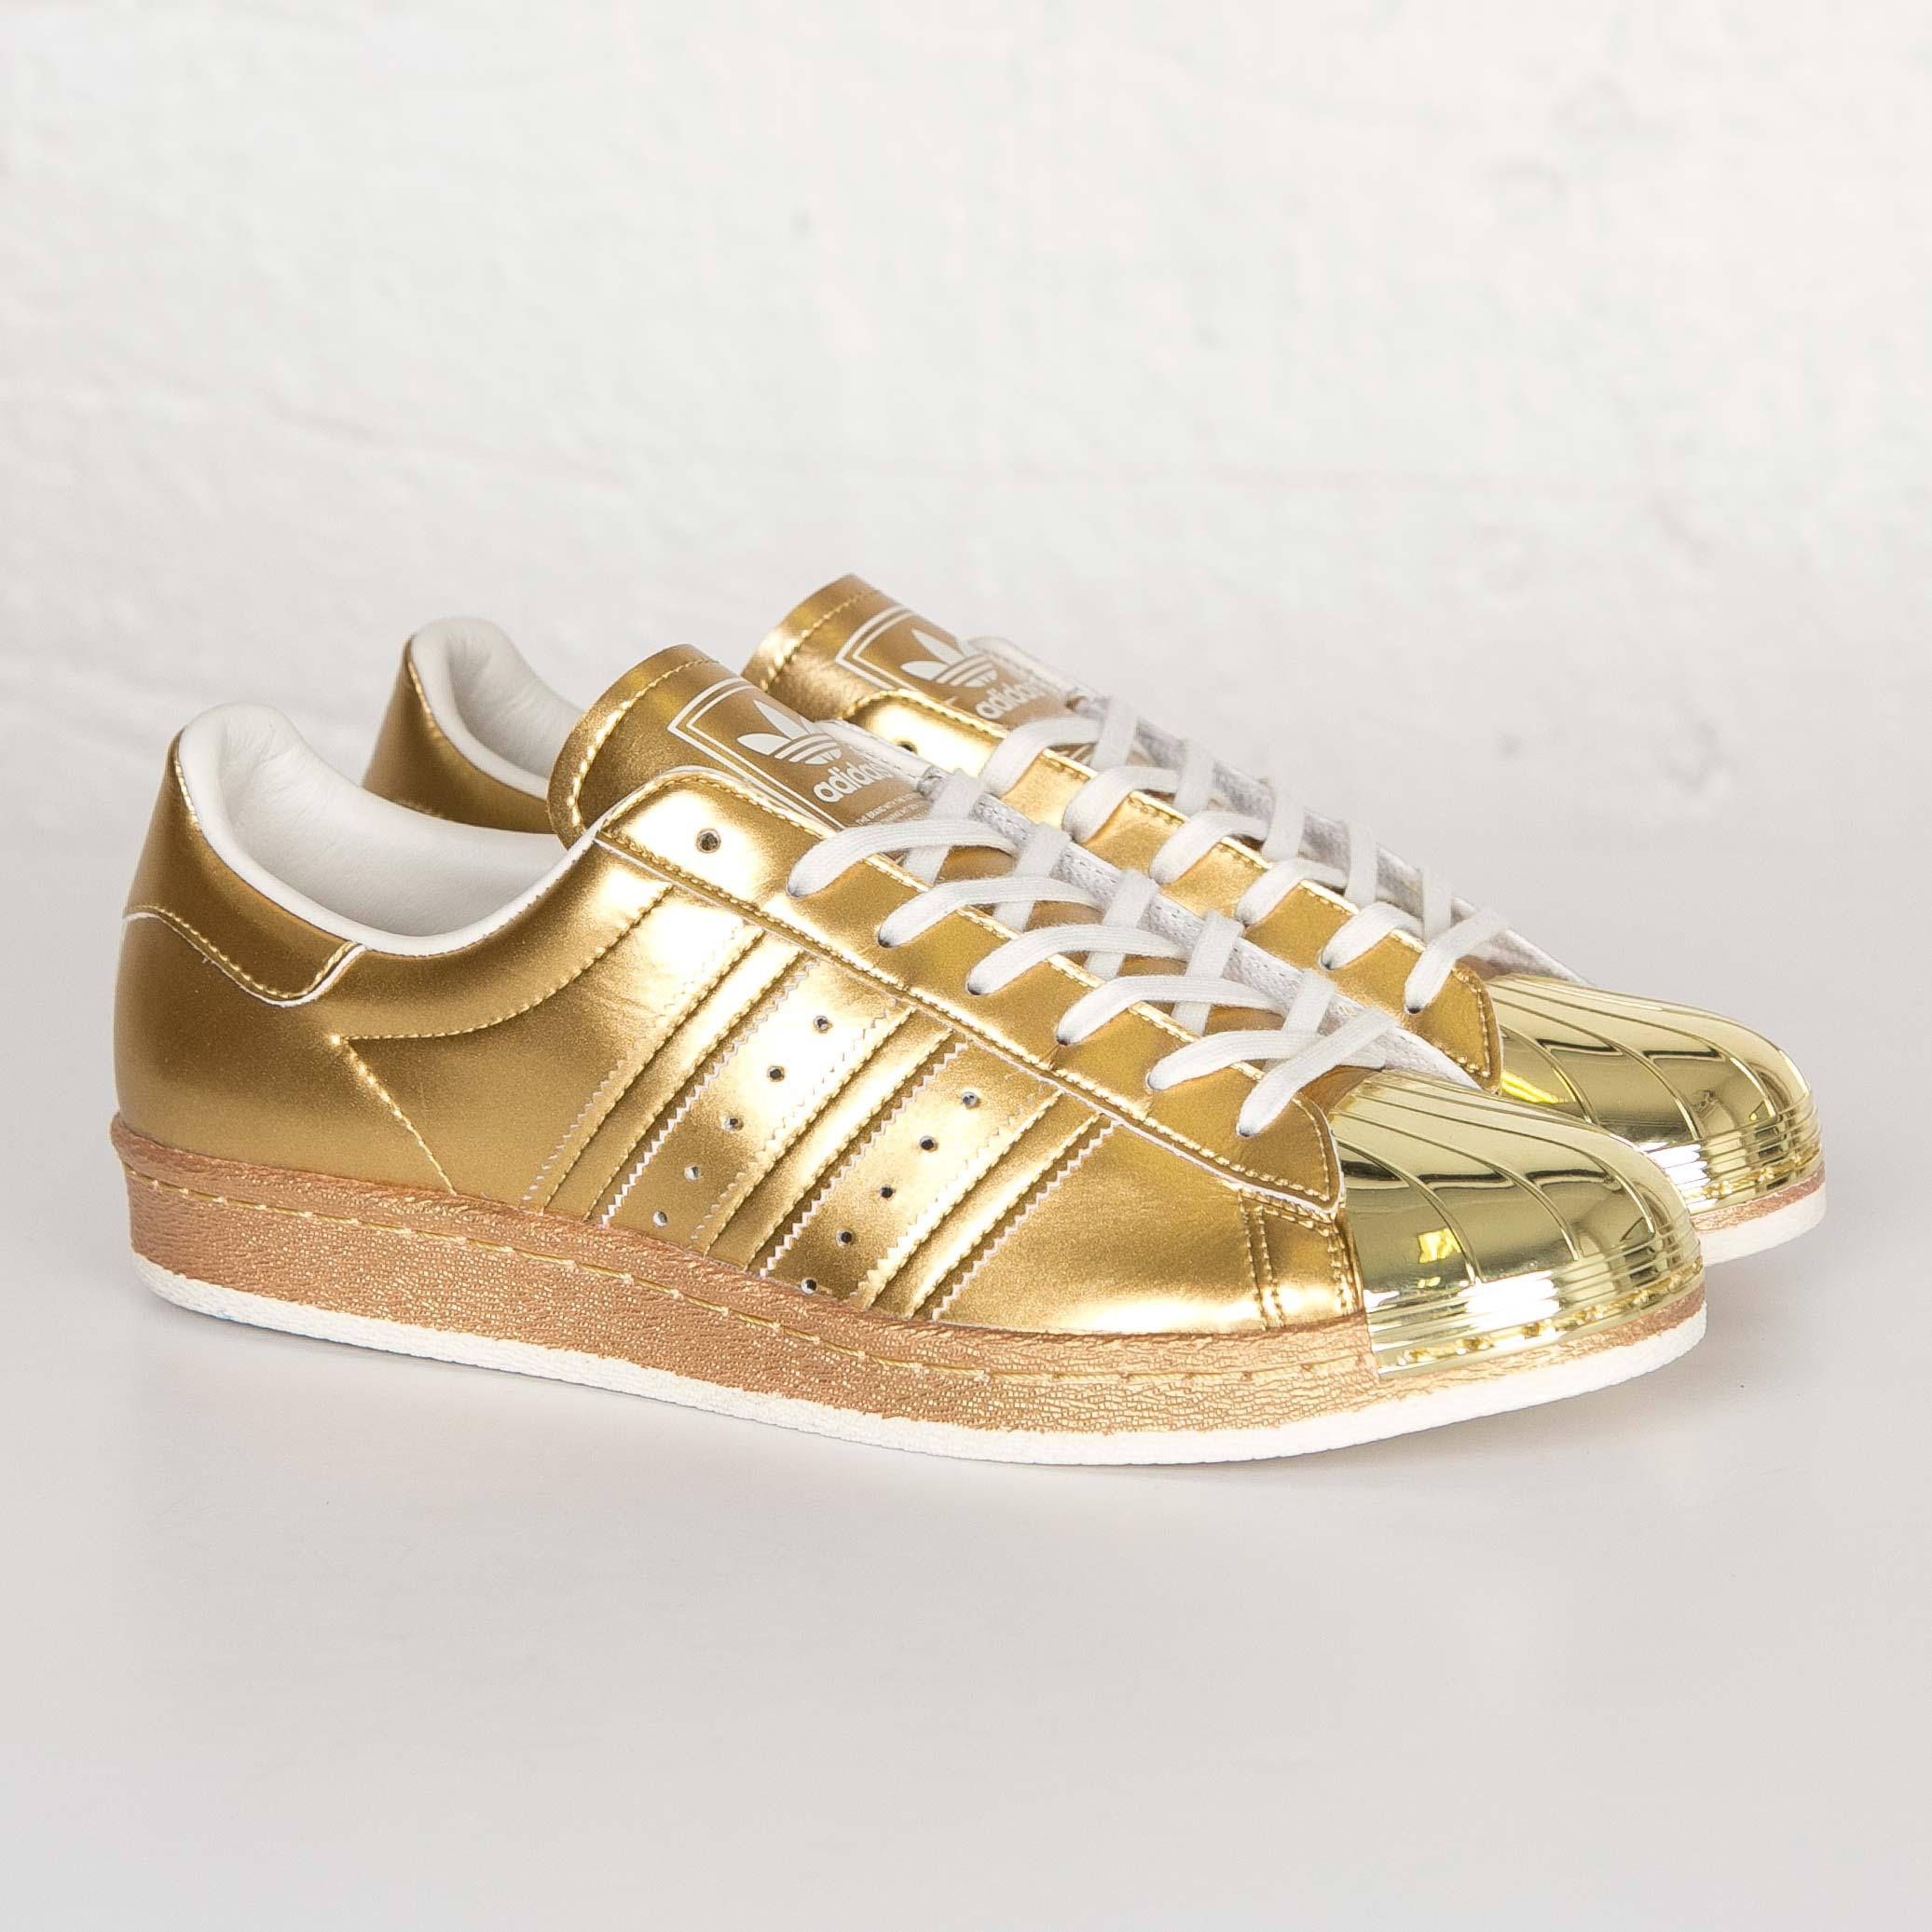 160bdef6bc4f adidas Superstar 80s Metallic Pack - S82742 - Sneakersnstuff ...